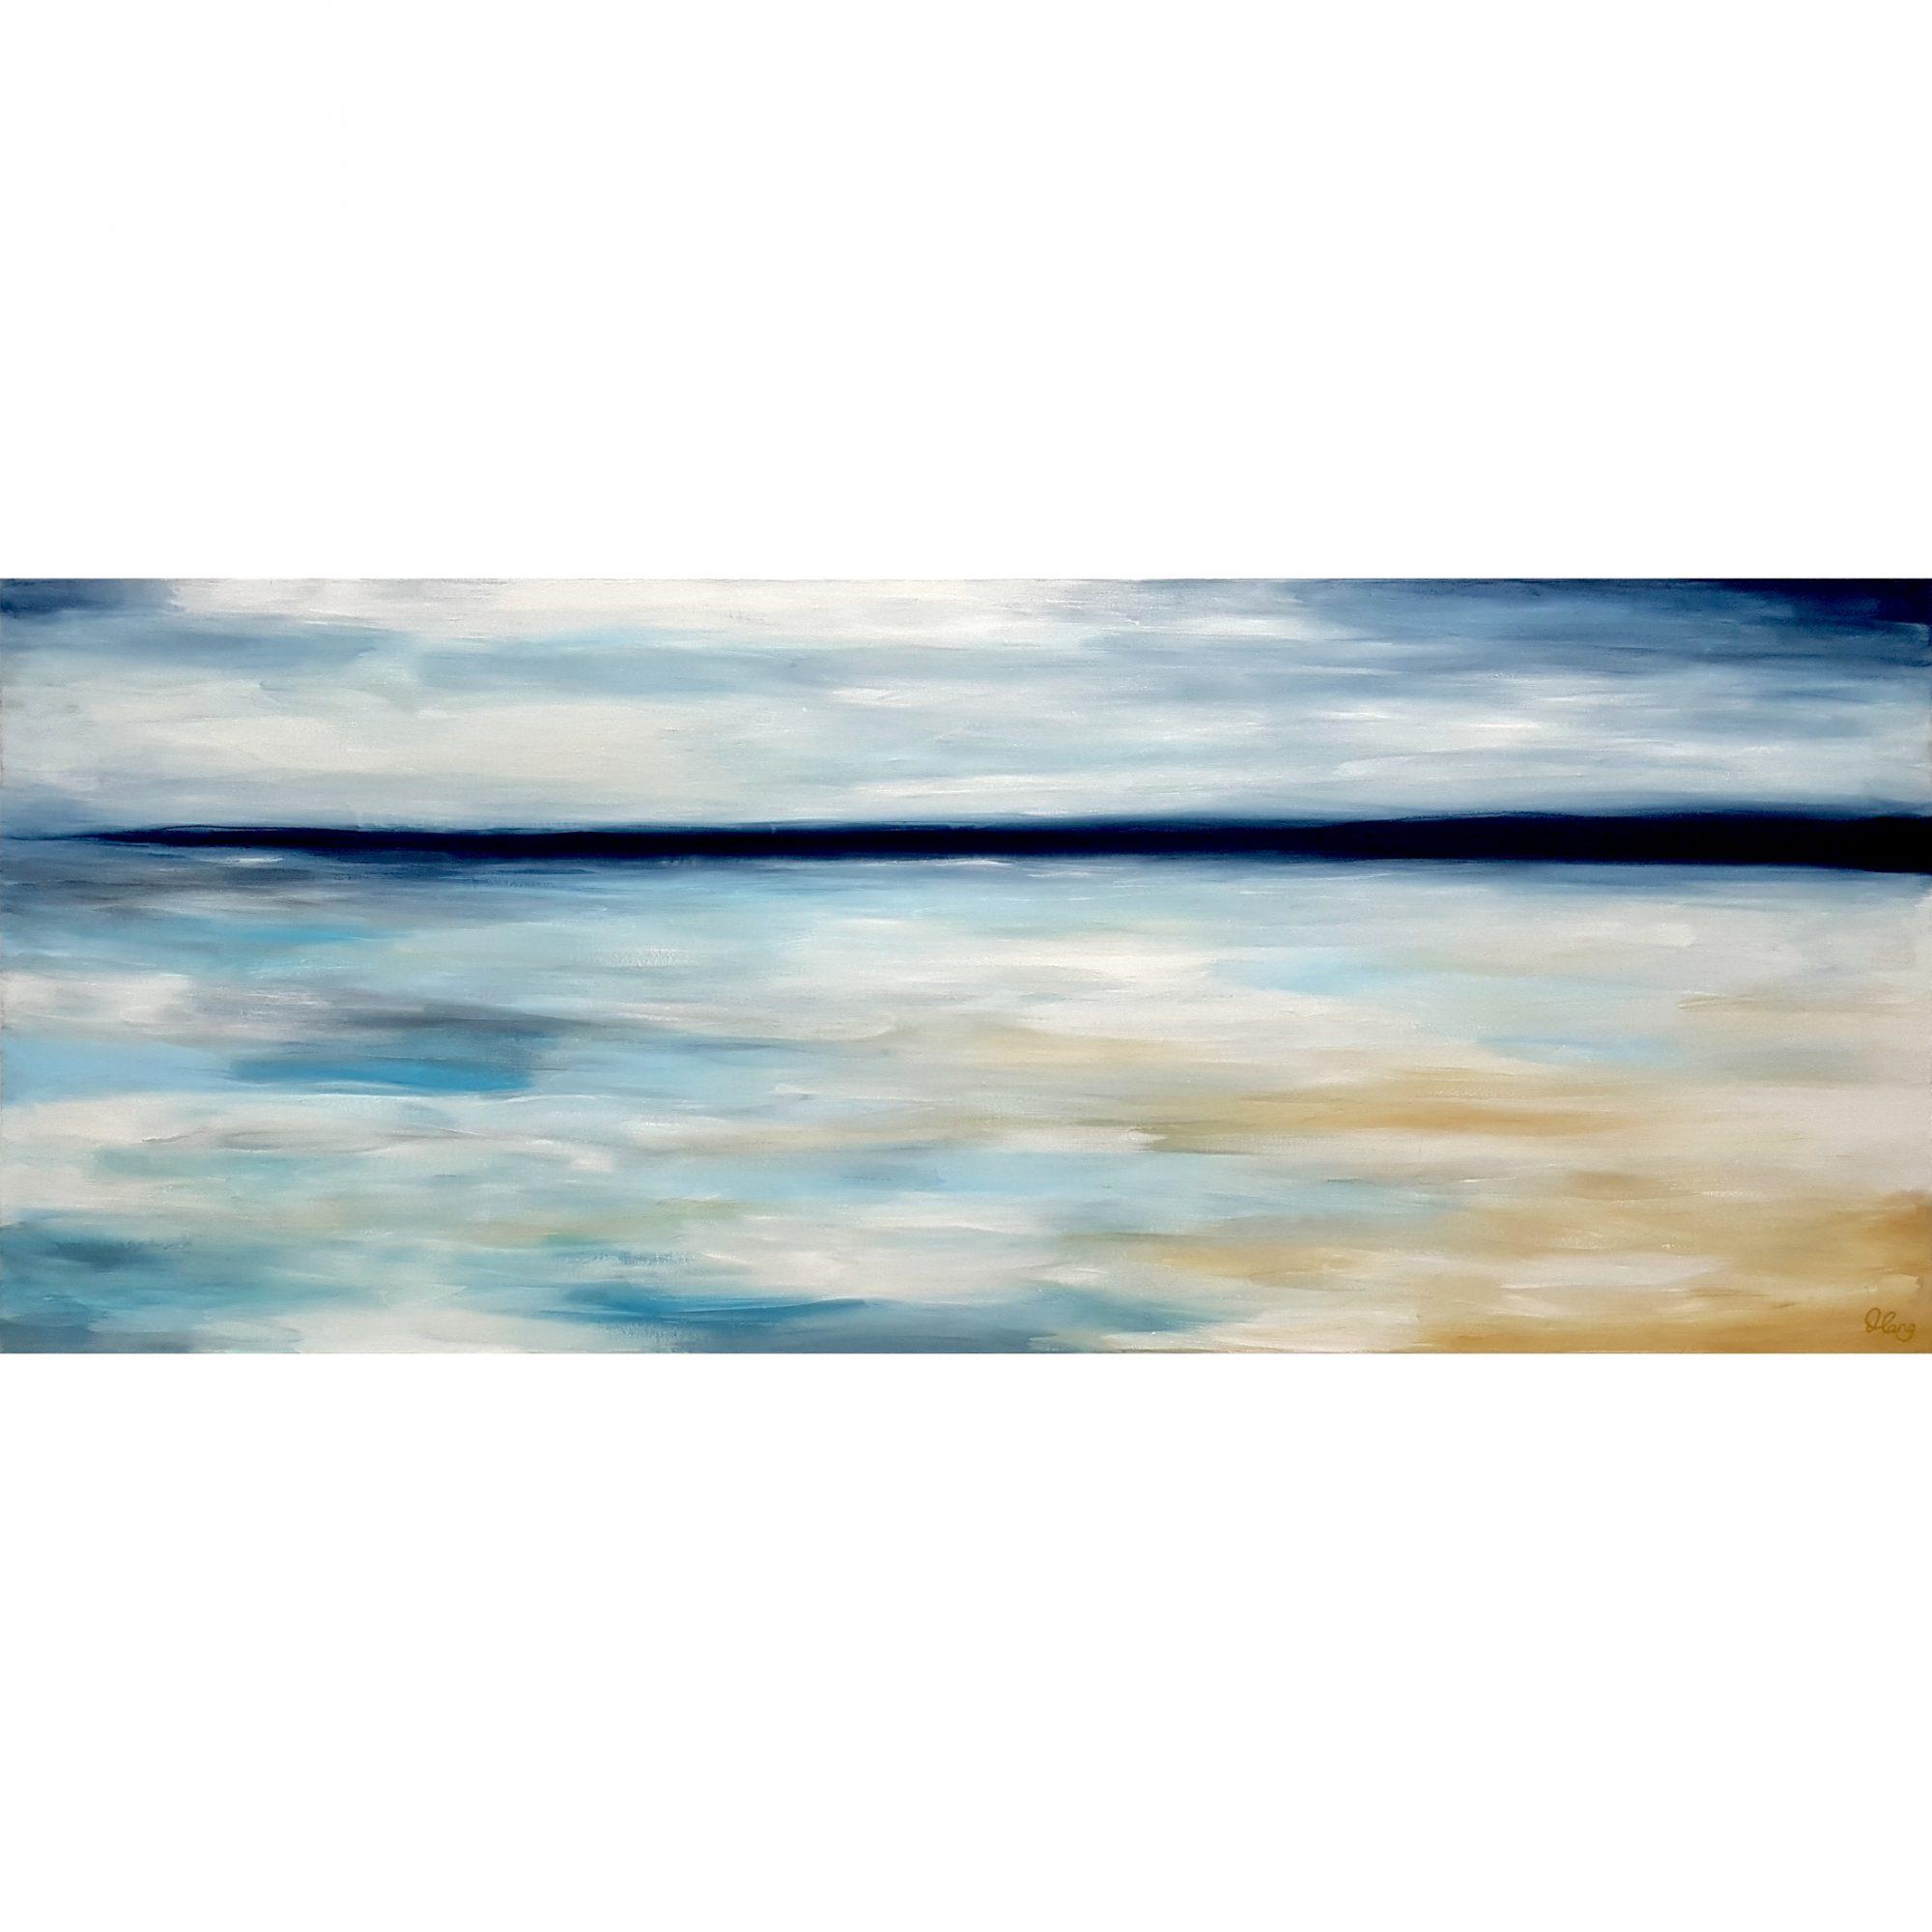 Calm Before The Storm Songbird Designz Deborah Lang Beachscene Canvas Coastal Hamptons Style 7